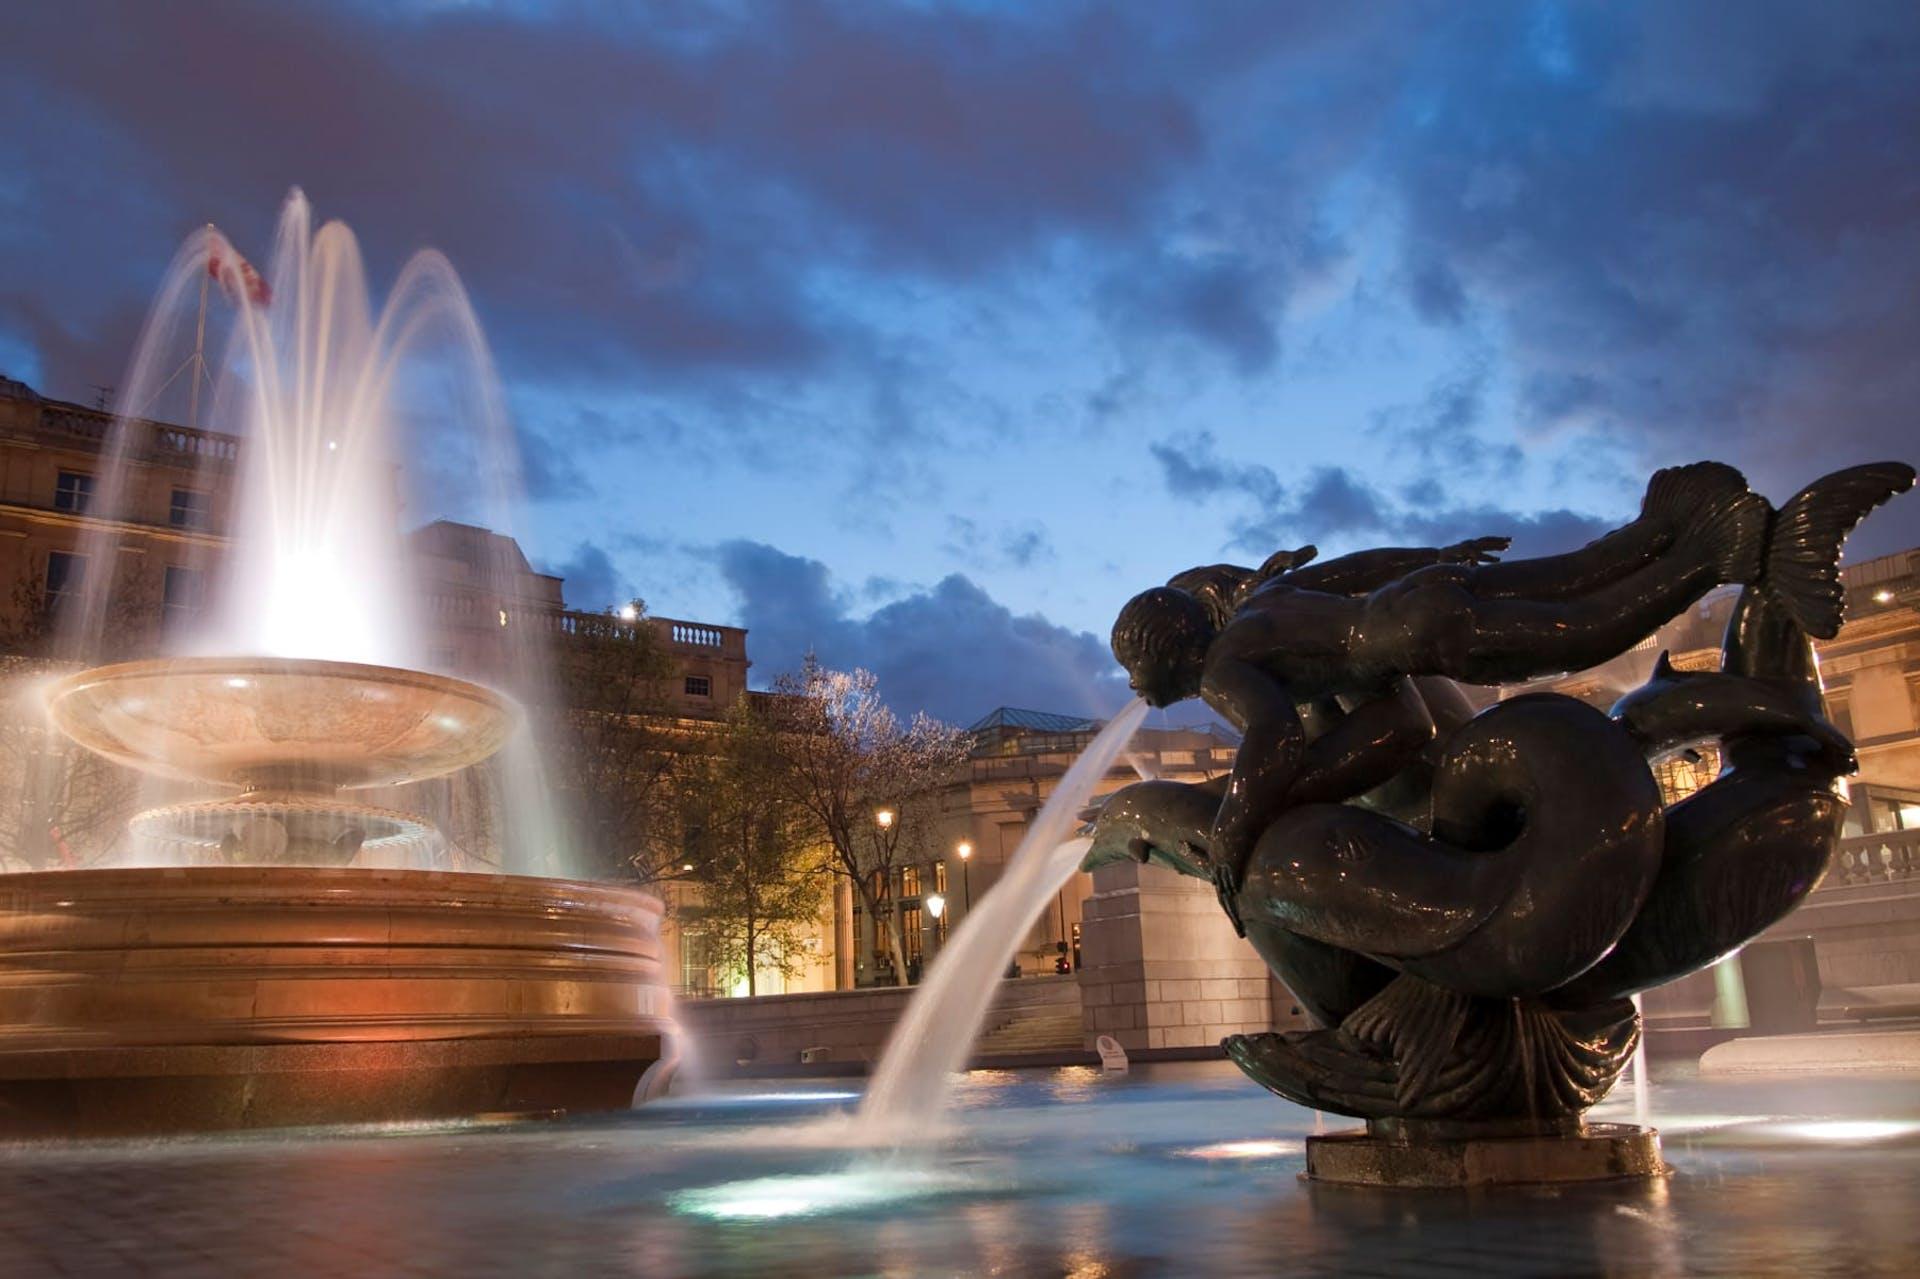 Fountains at Trafalgar Square, London